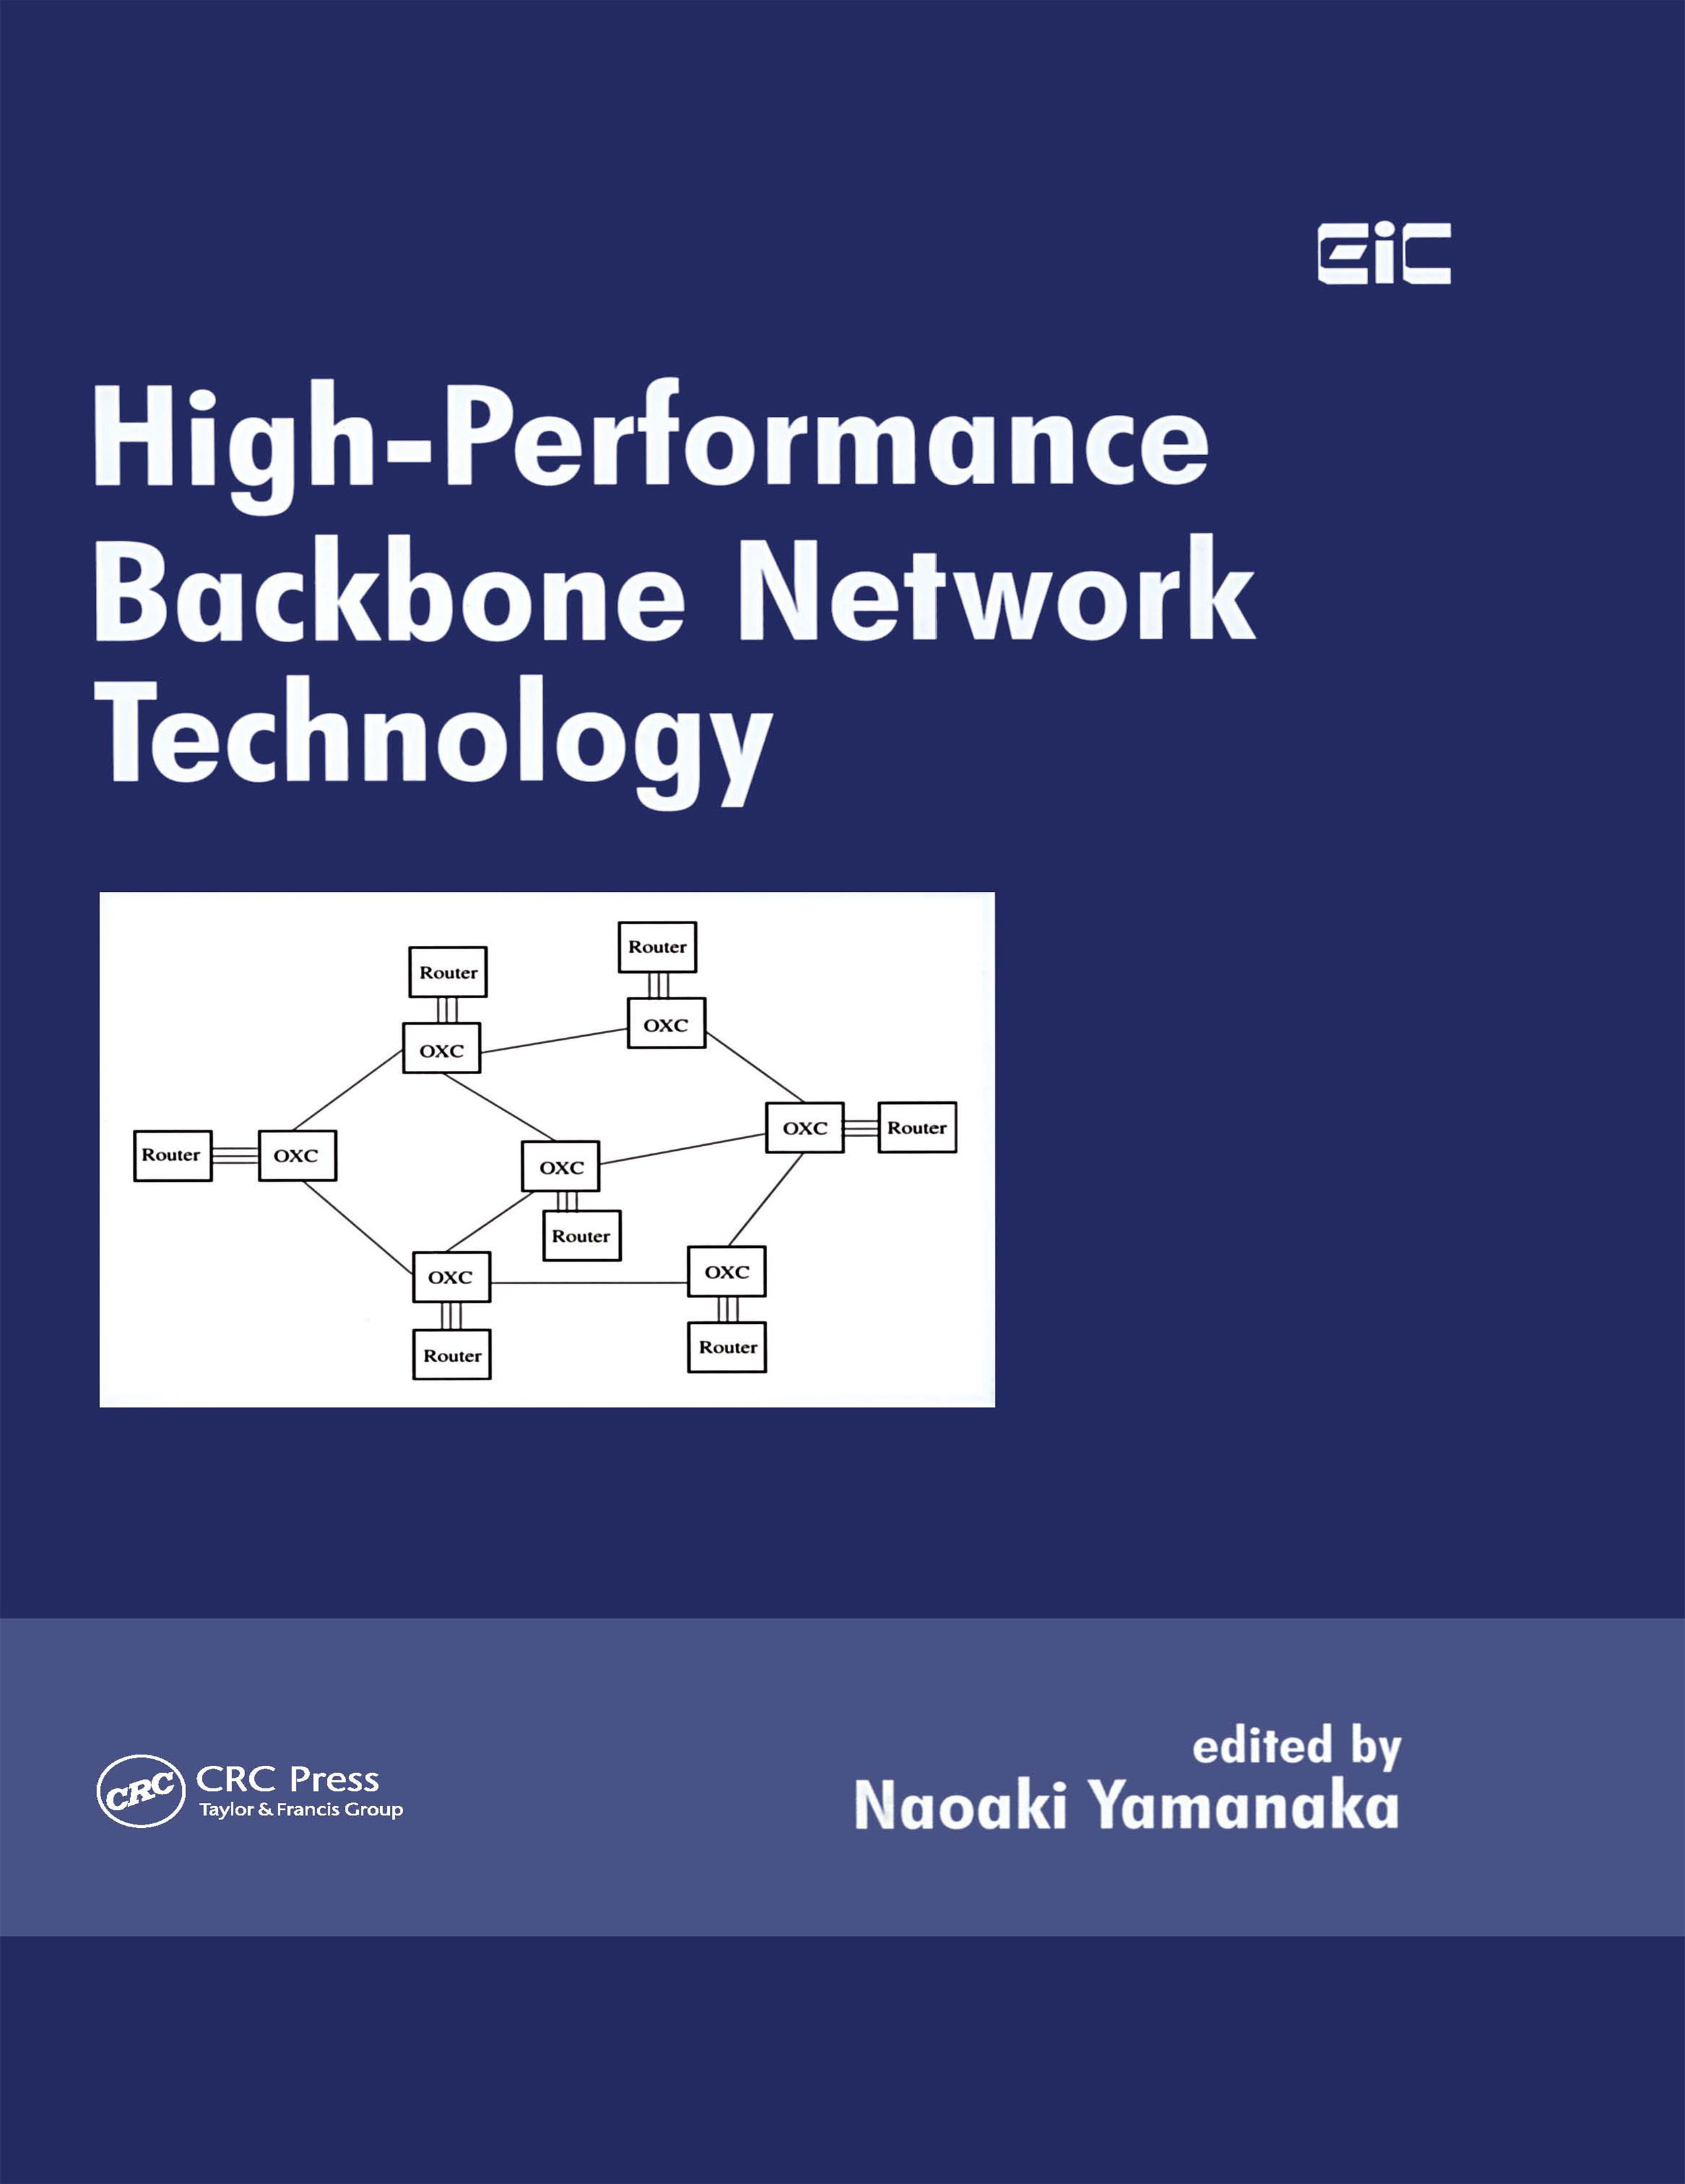 High-Performance Backbone Network Technology